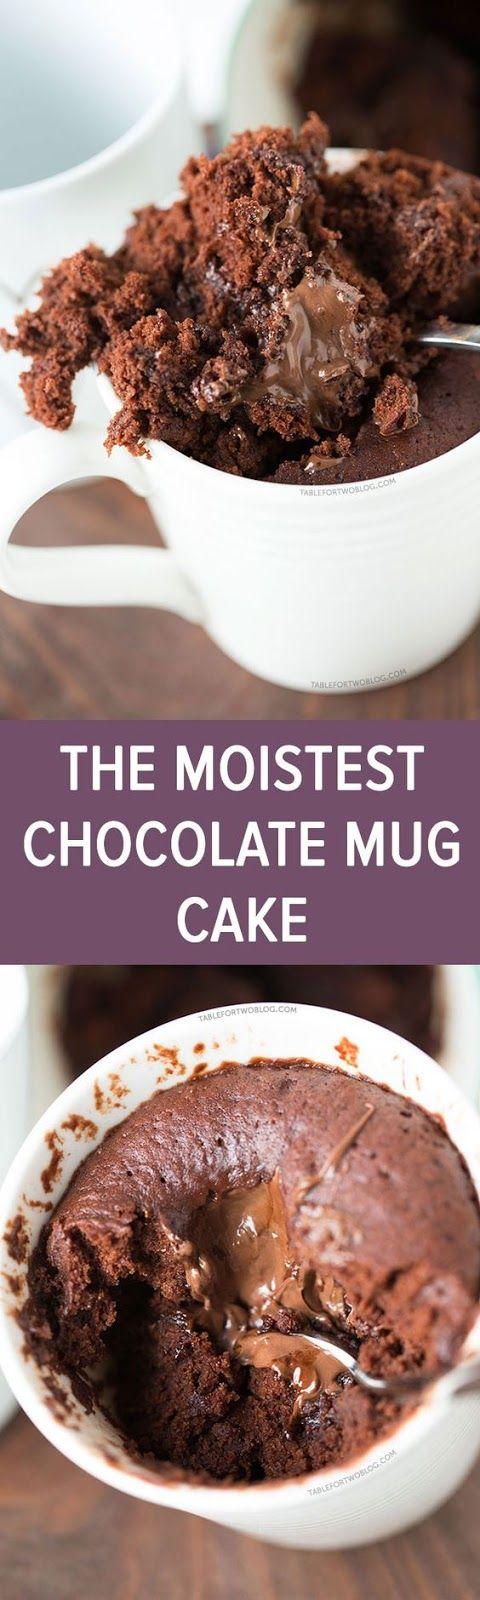 THE MOISTEST CHOCOLATE MUG CAKE | Food And Cake Recipes